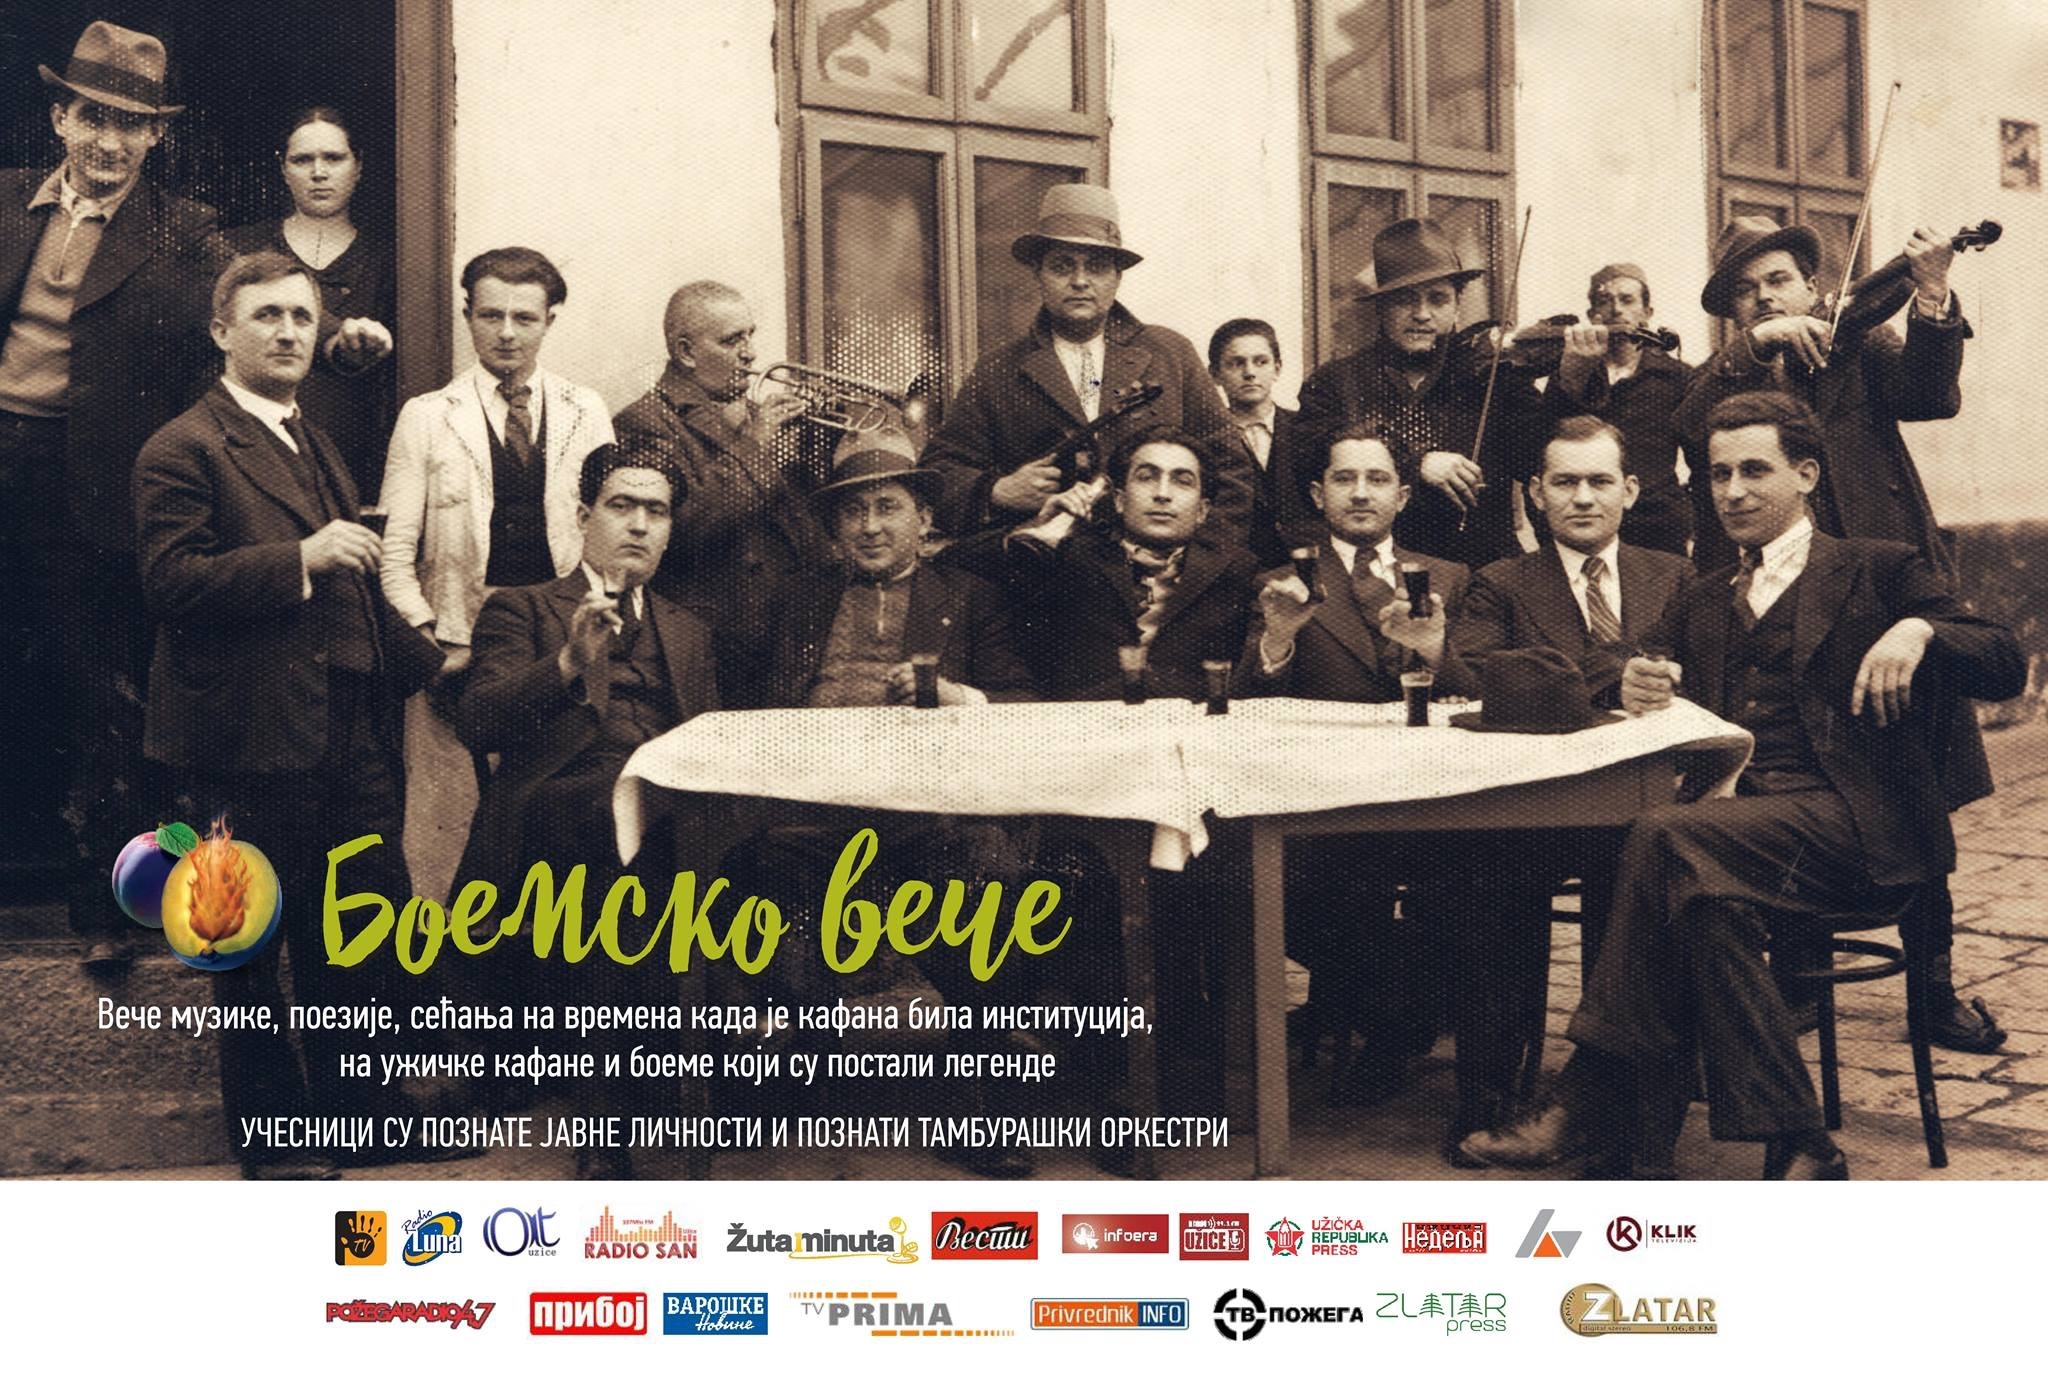 Boemsko